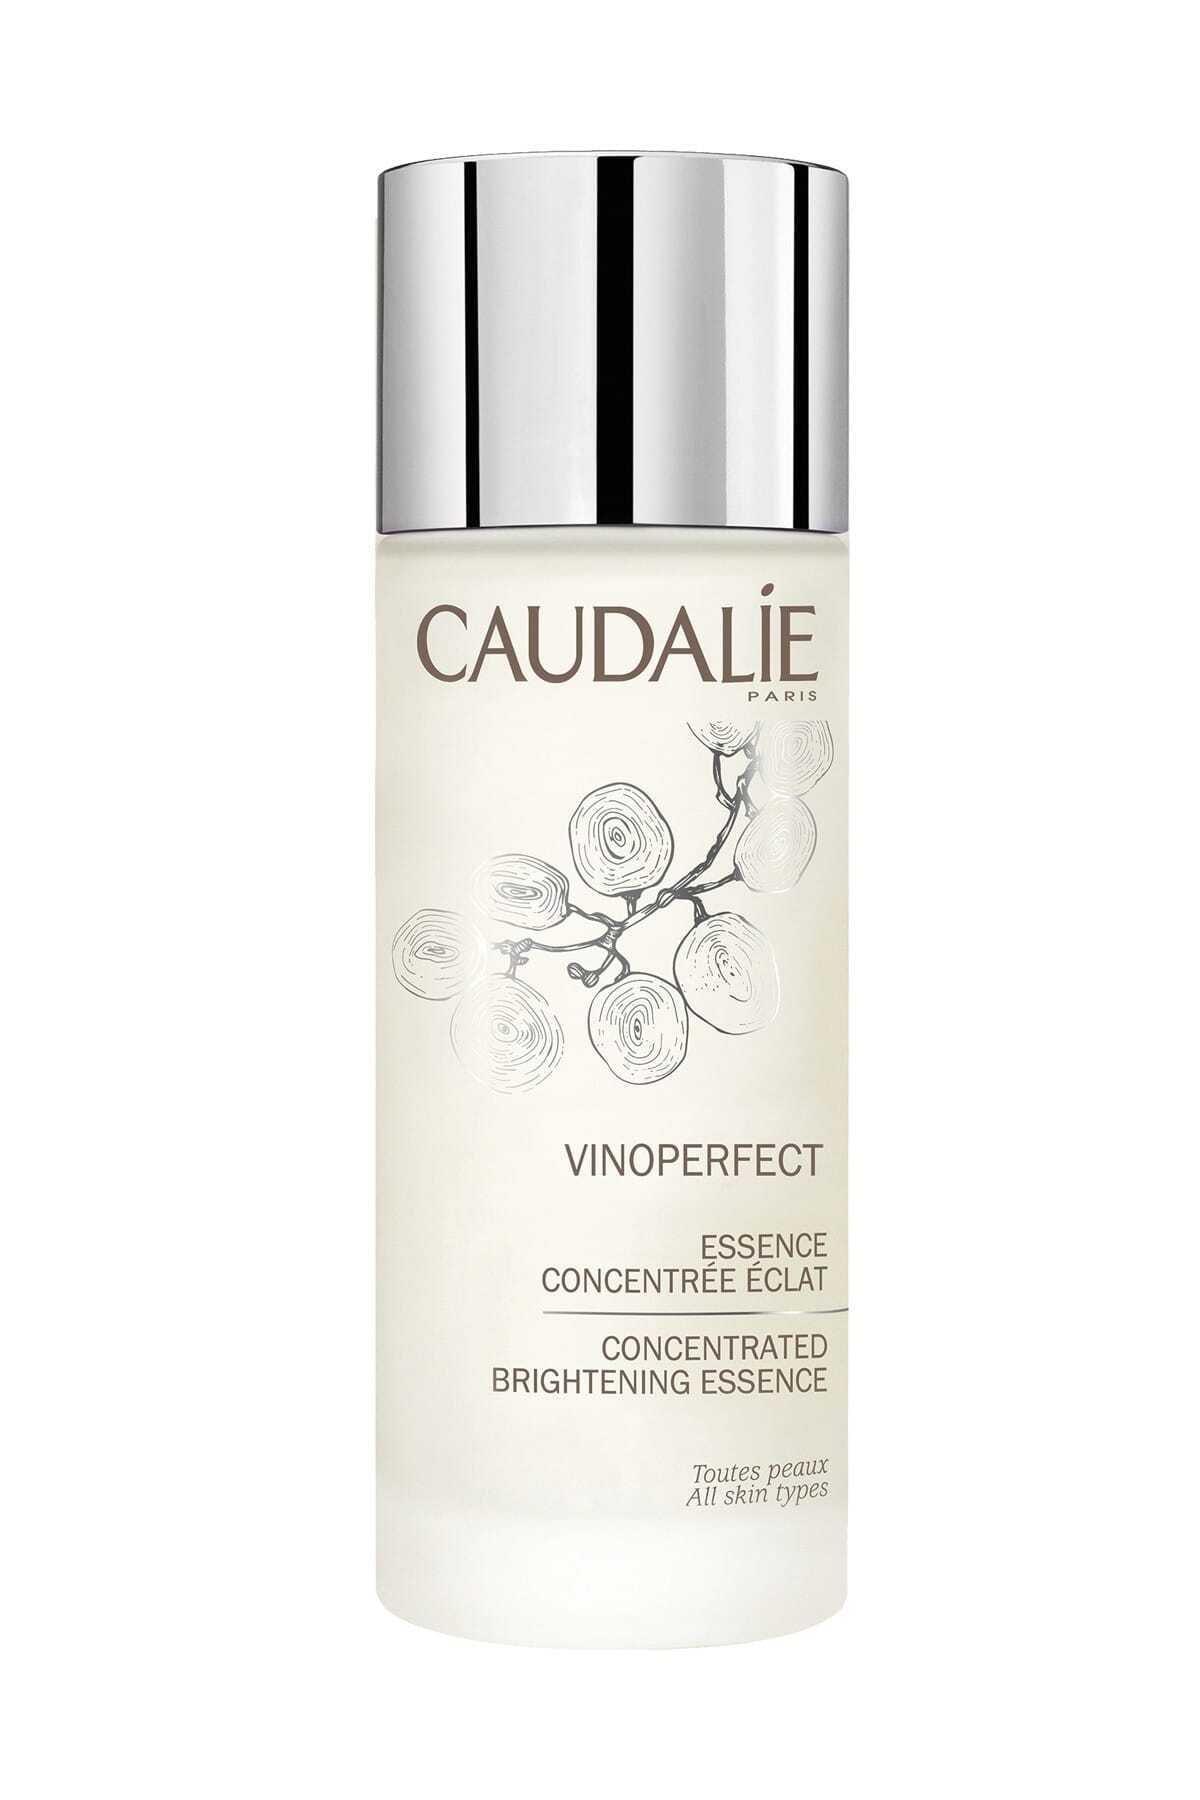 Caudalie Vinoperfect Concentrated Brightening Essence 100 ml 1